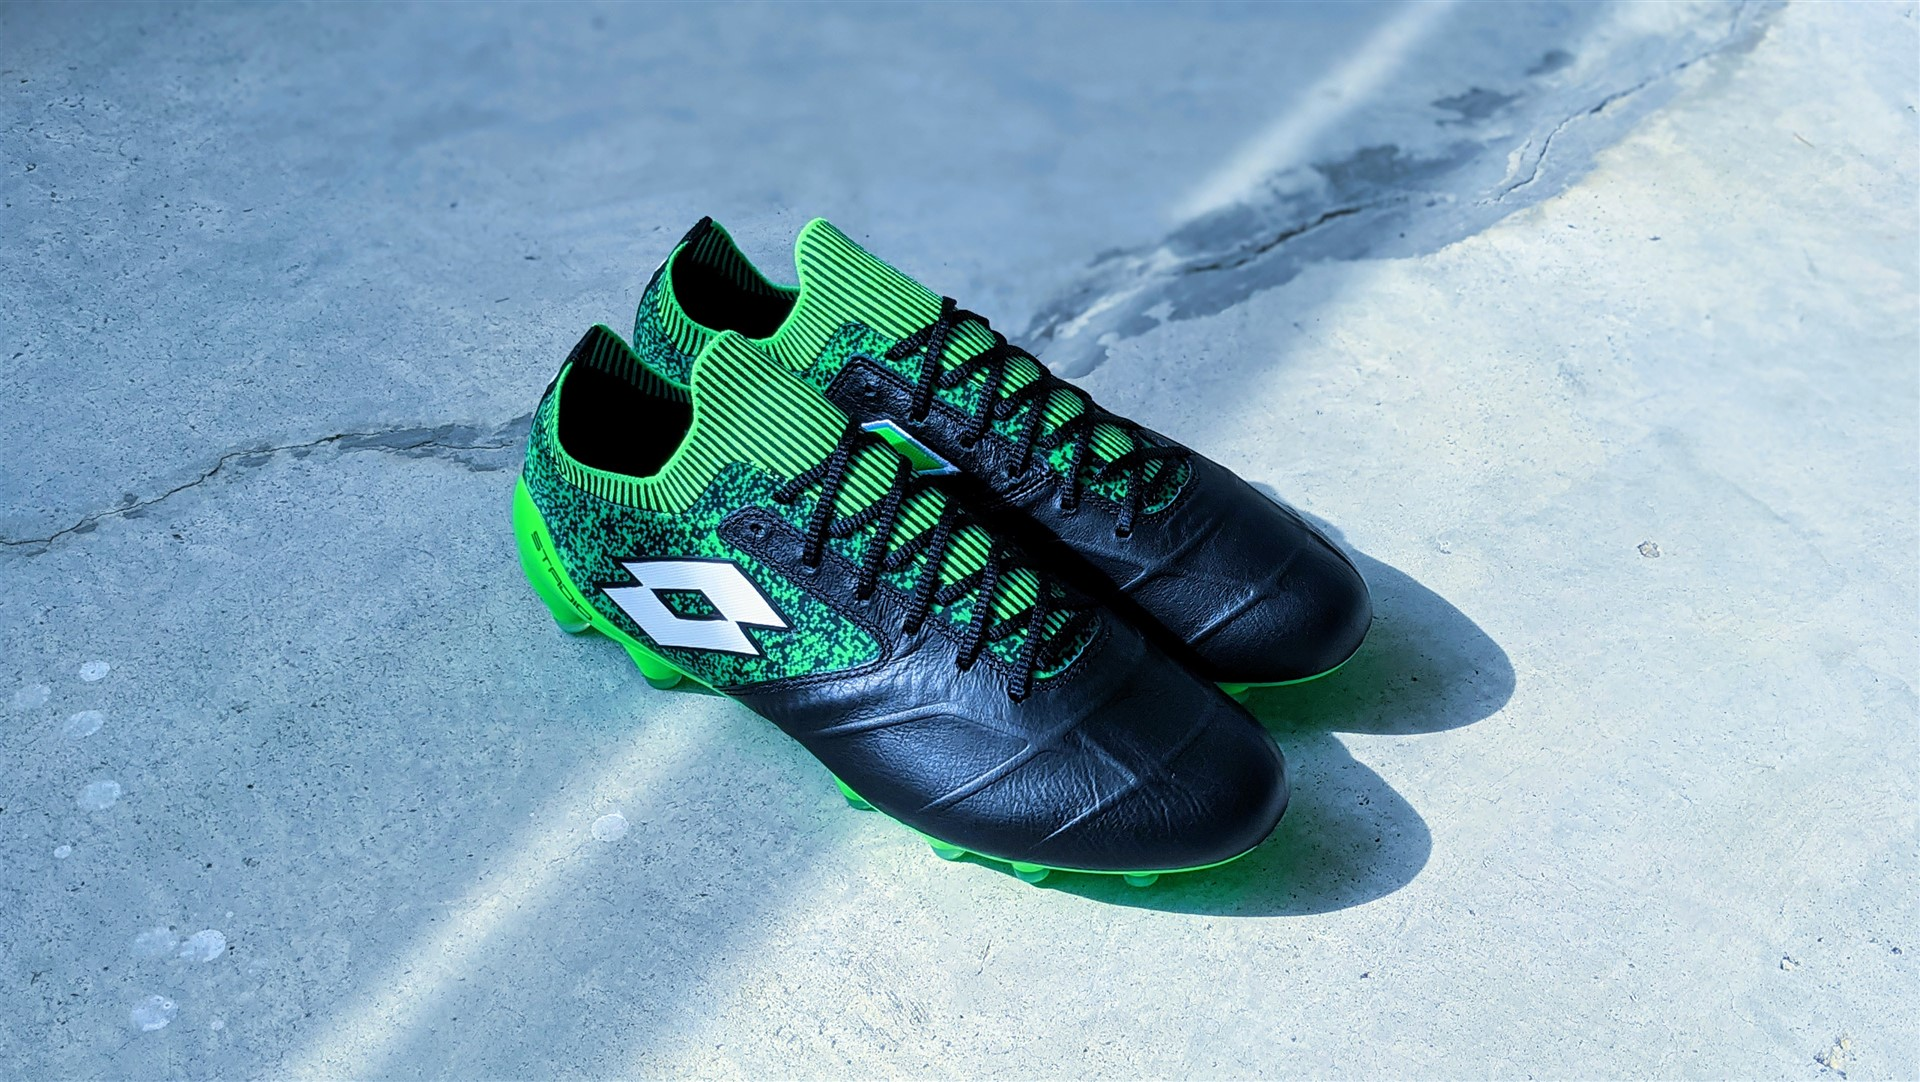 Lotto Stadio 100 II football boots soccer cleats